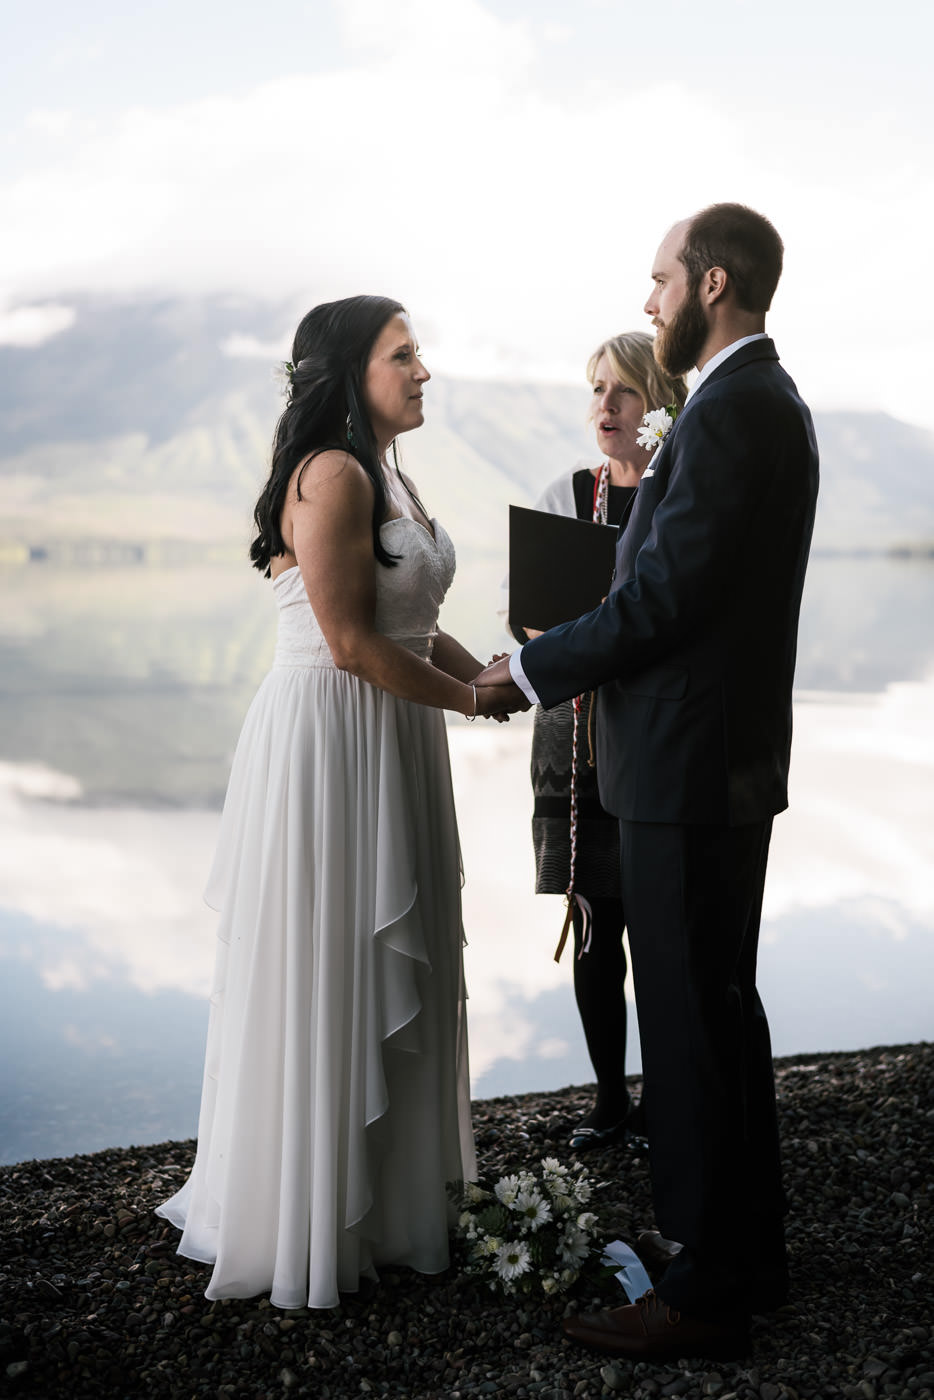 Adventurous elopement on the lake shore in Glacier National Park.